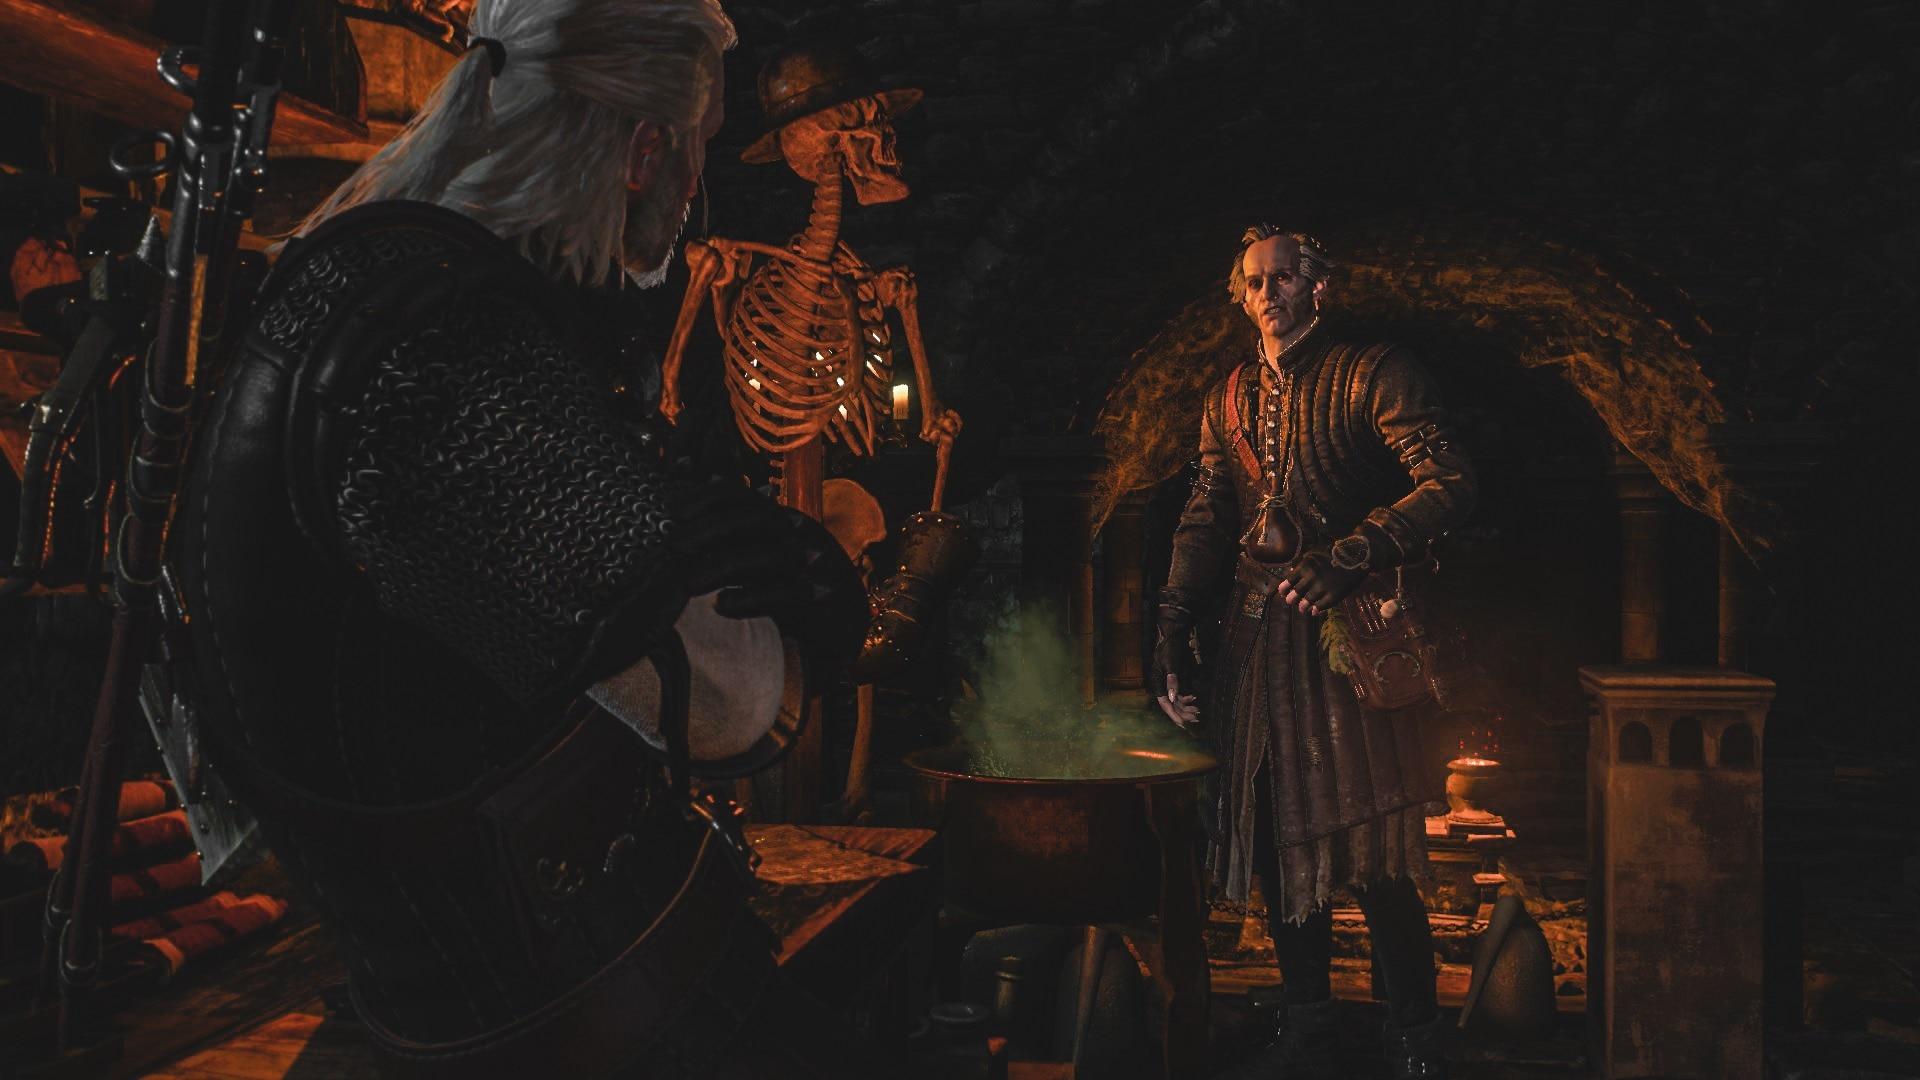 drfvg.jpg - Witcher 3: Wild Hunt, the